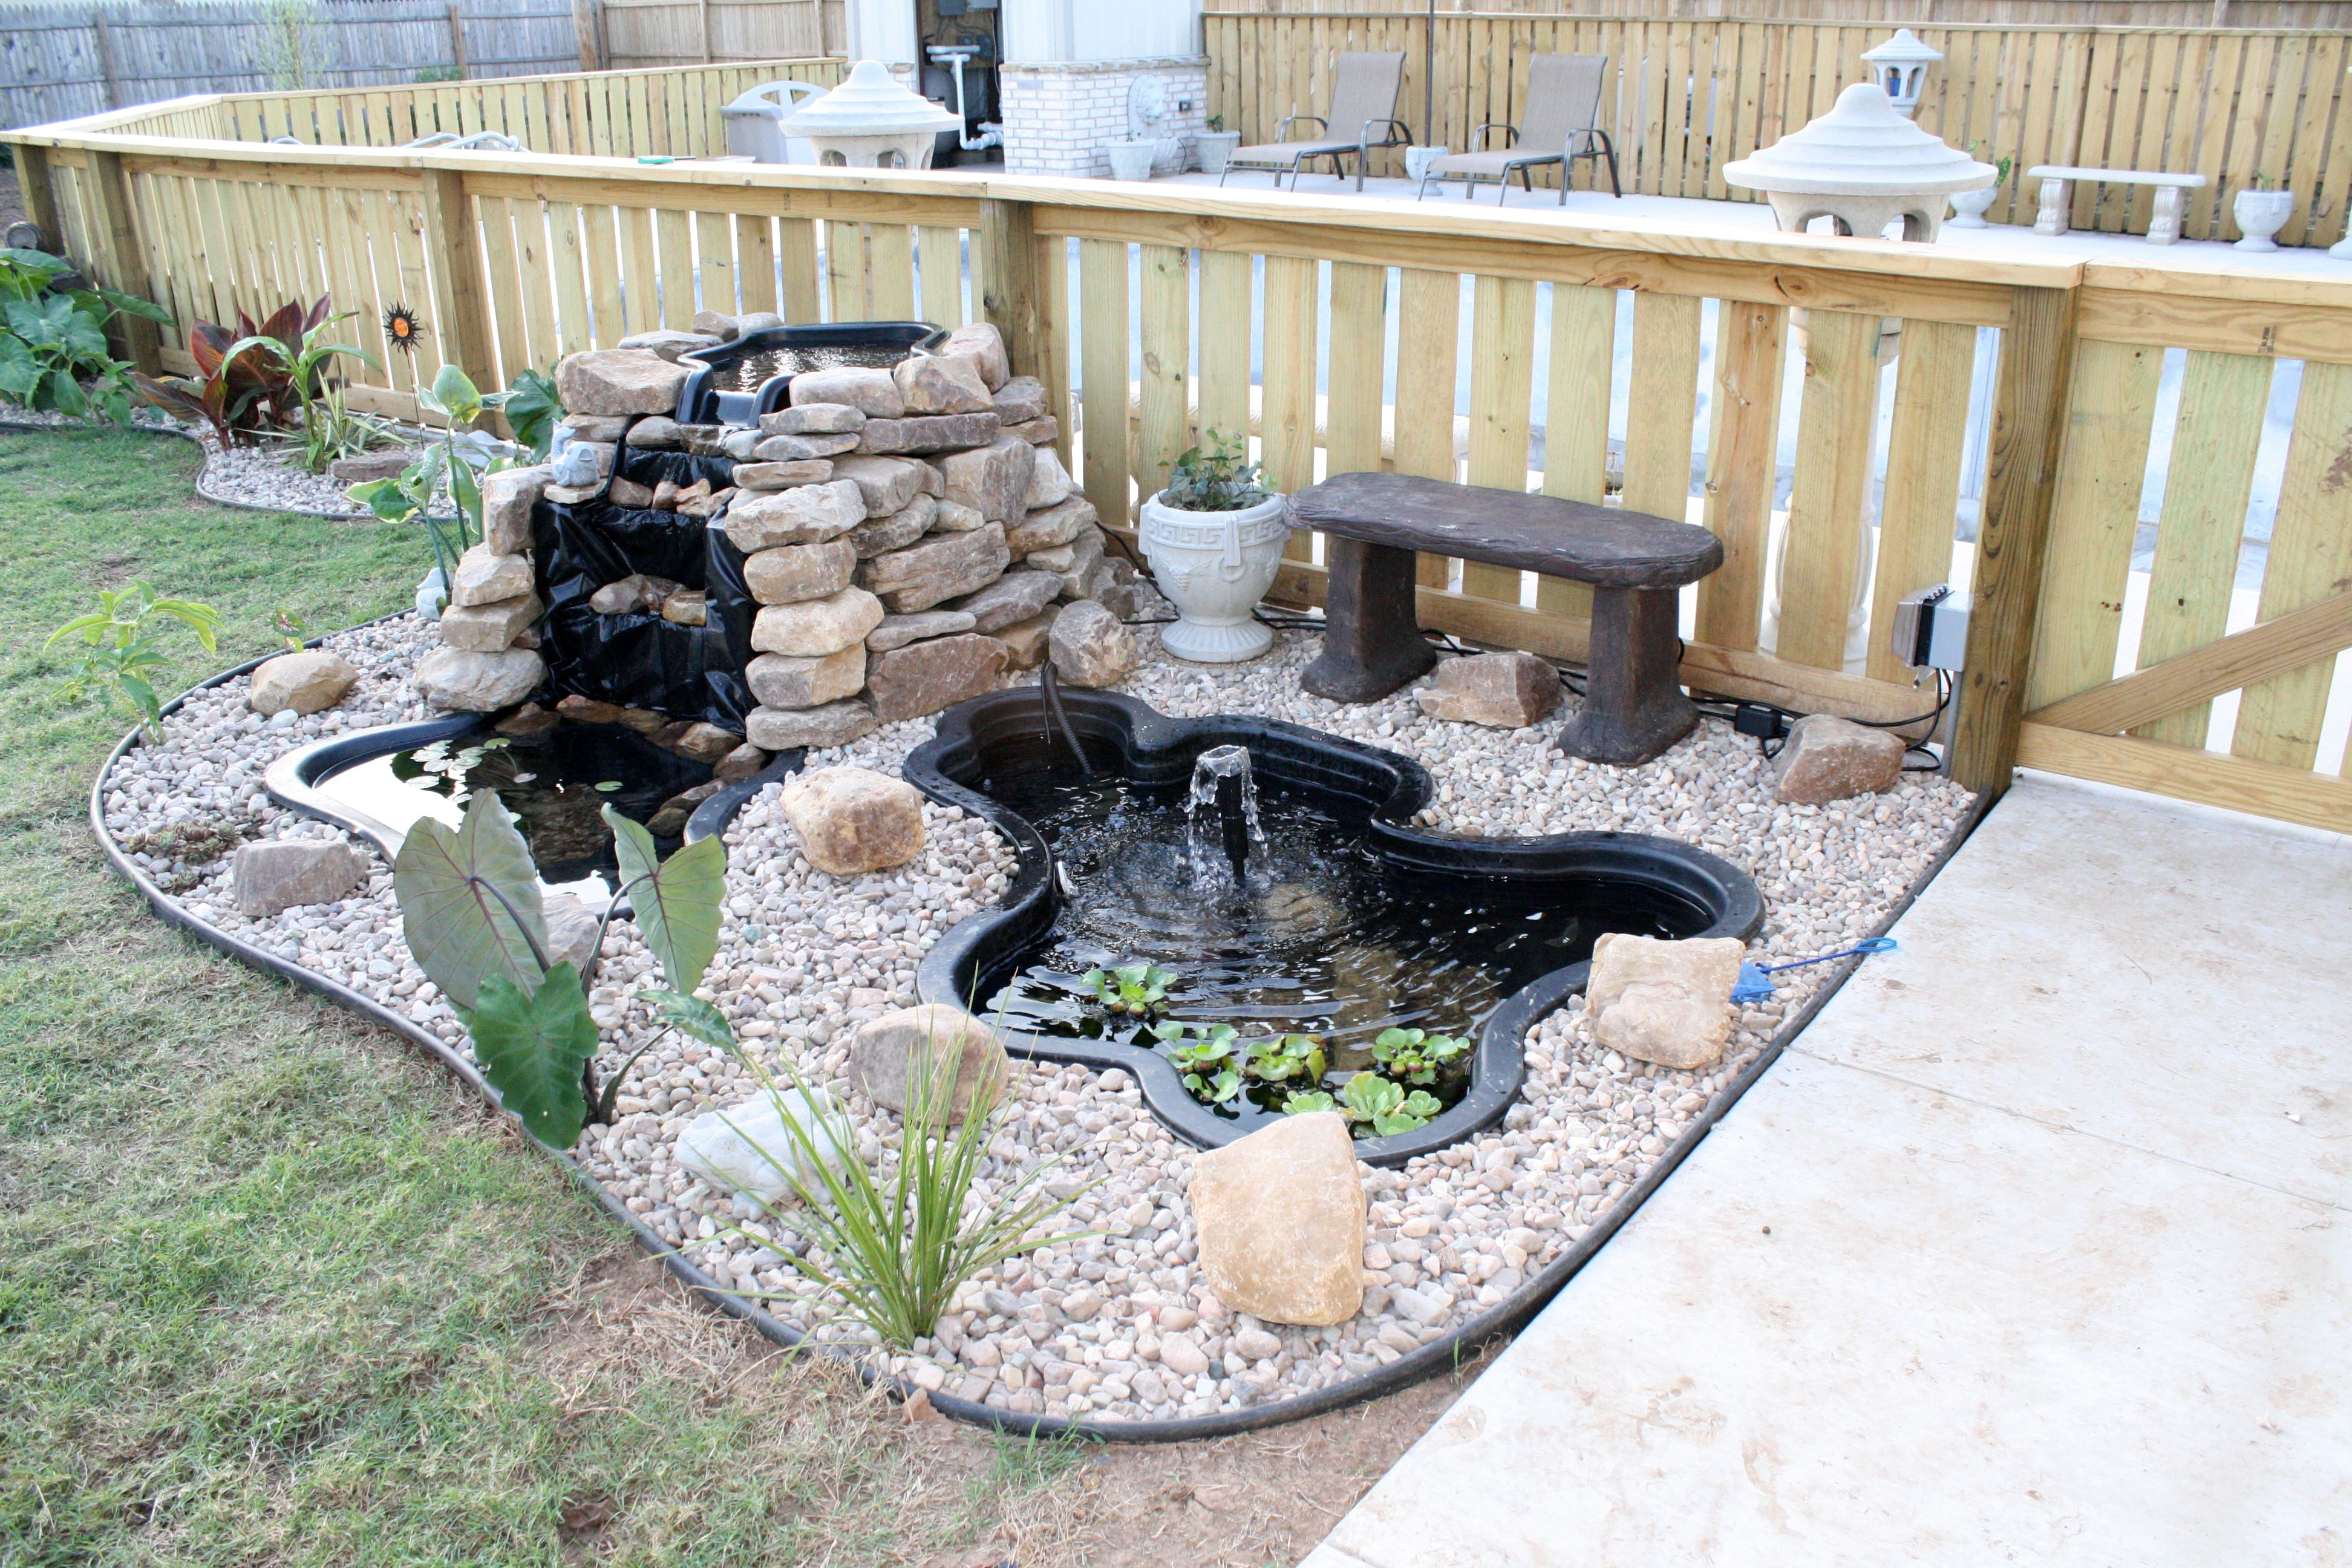 Backyard Fish Pond | Fish pond gardens, Outdoor fish ponds ...